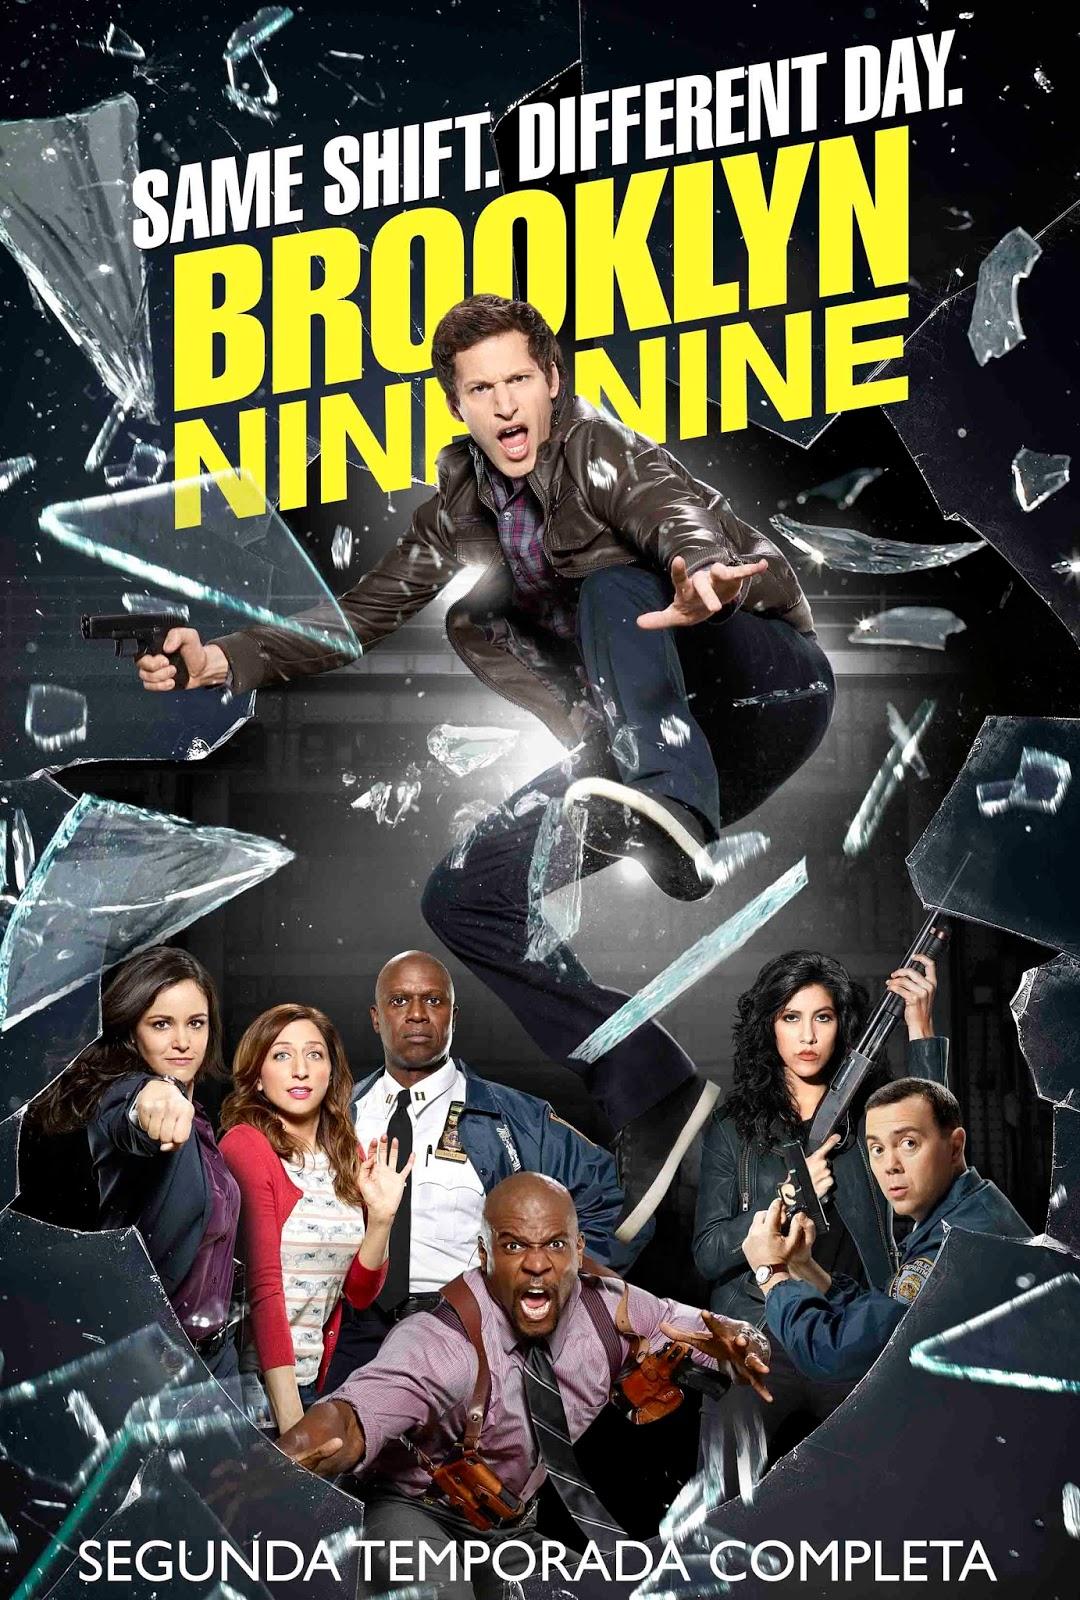 Brooklyn Nine-Nine 2ª Temporada Torrent - BluRay 720p Dublado